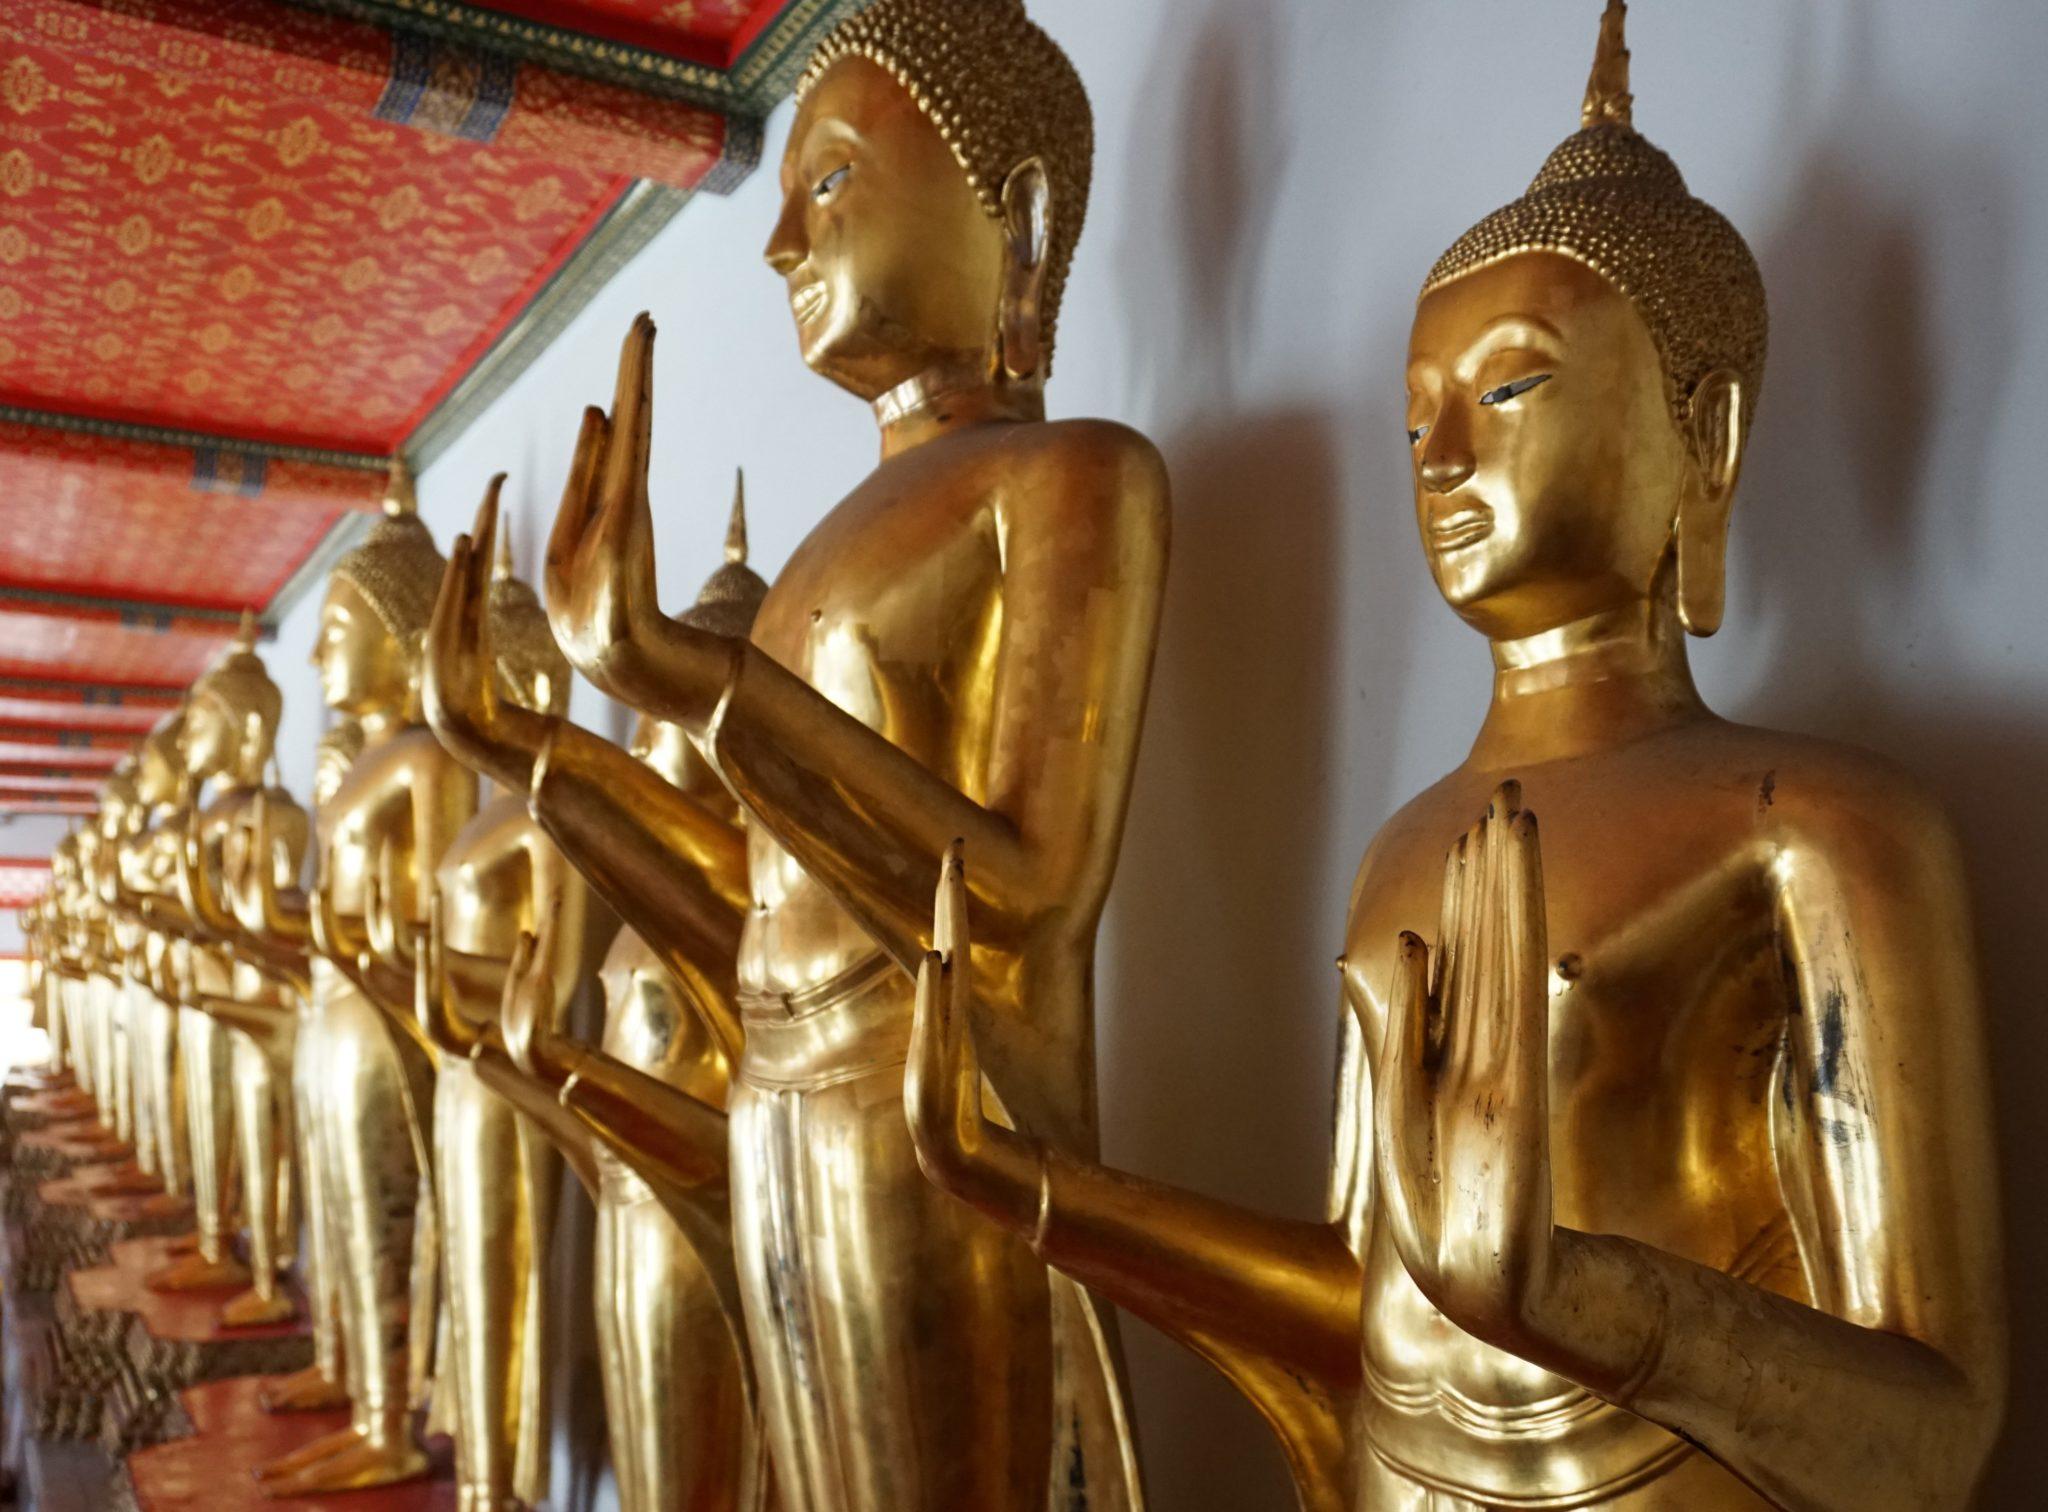 Goldene Buddha-Statuen im Tempel in Bangkok